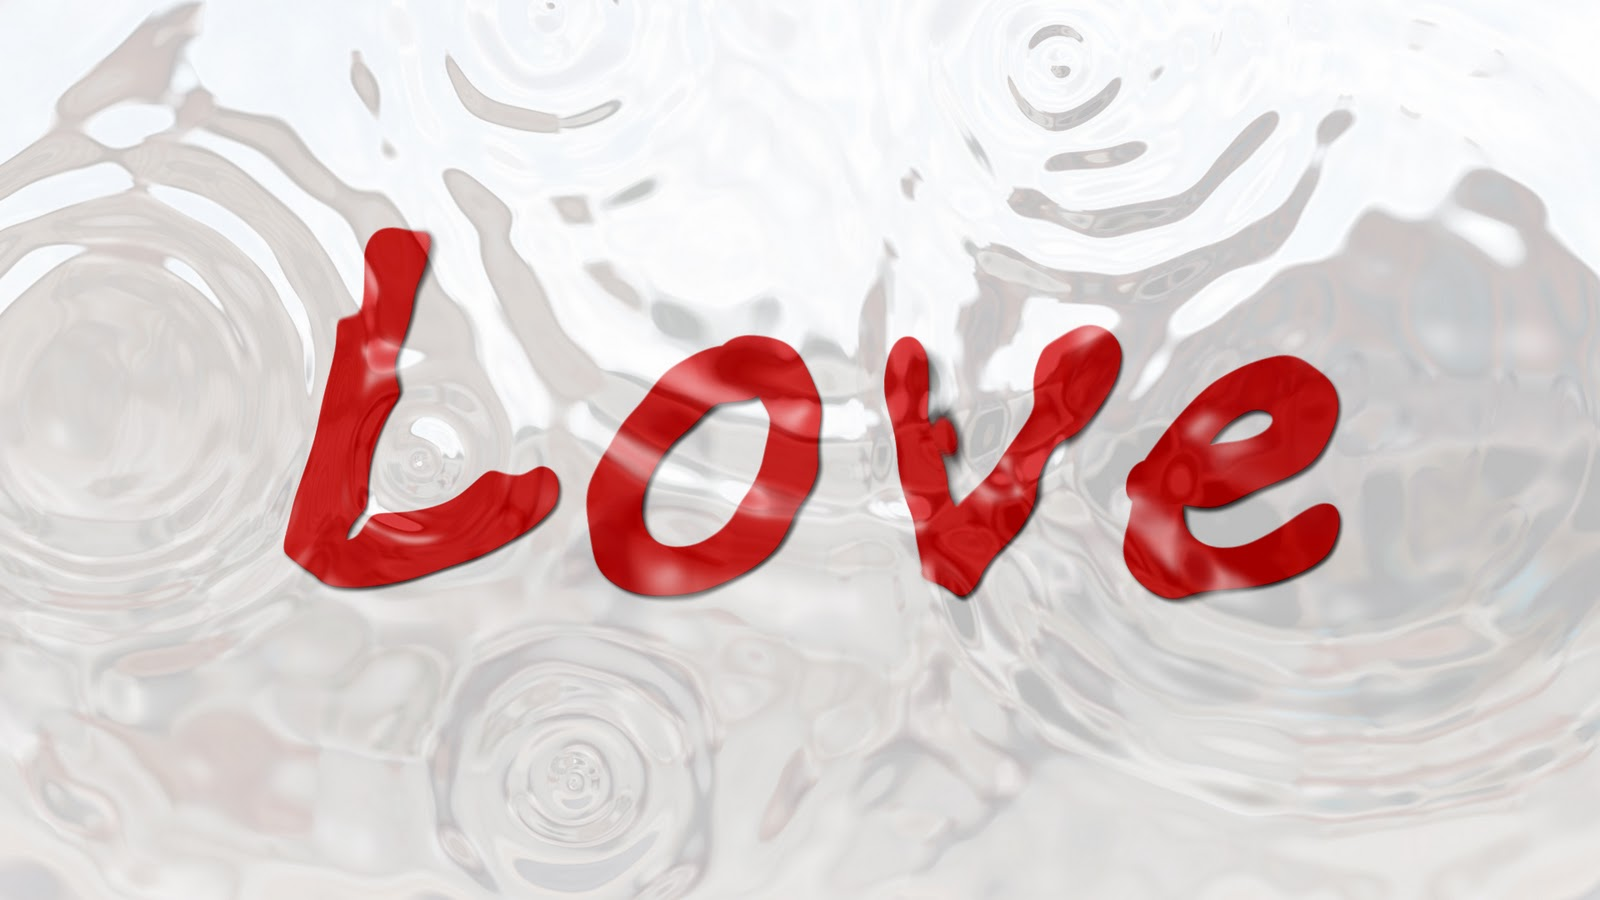 hd wallpapers for desktop: Love HD Wallpapers